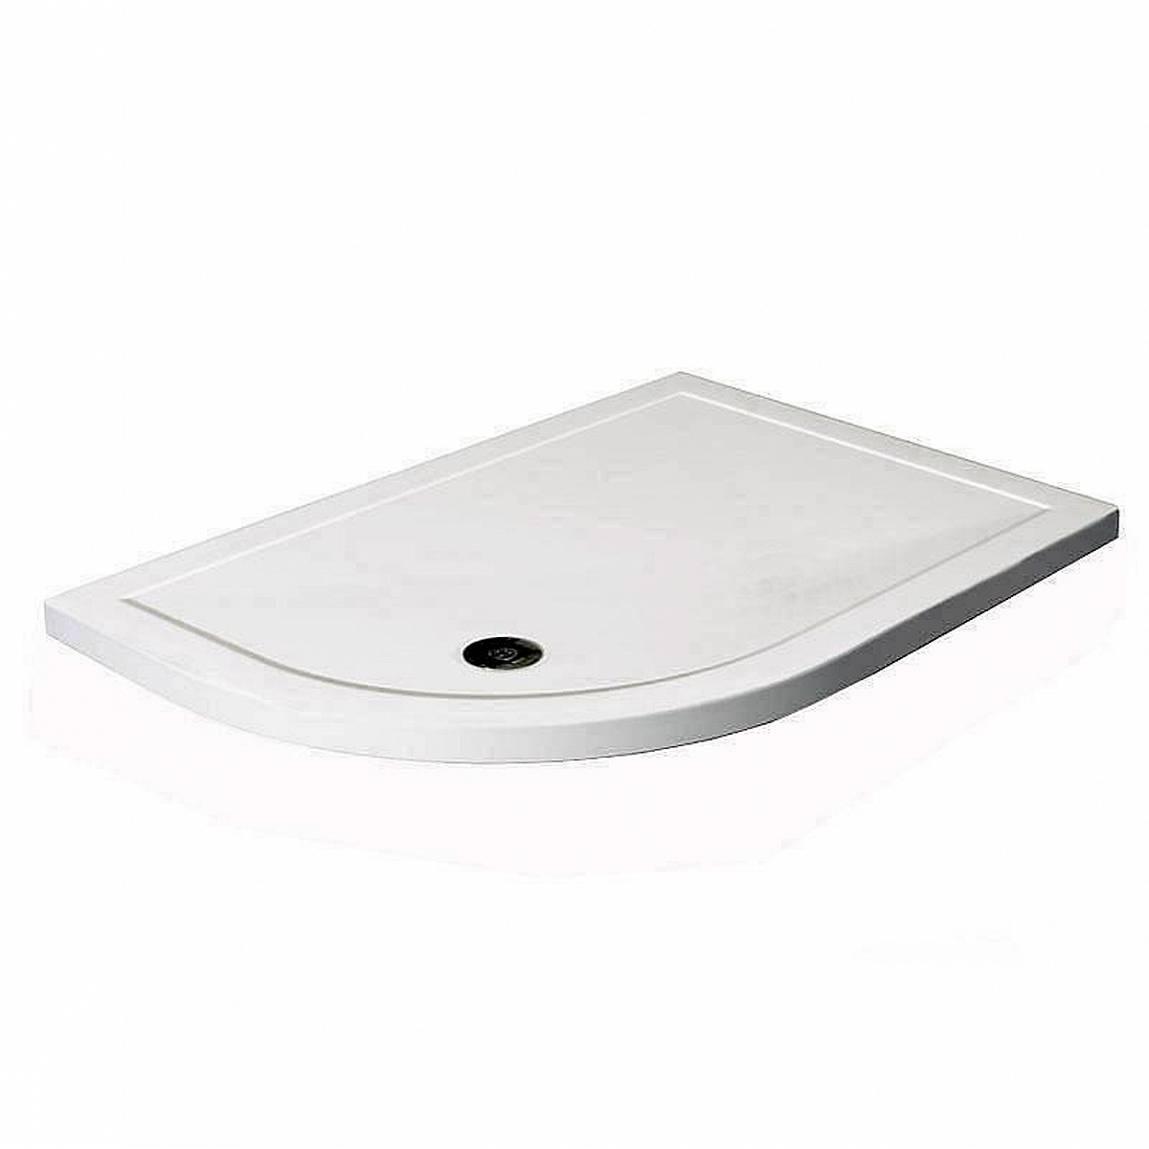 Image of Offset Quadrant Stone Shower Tray 1200 x 900 LH